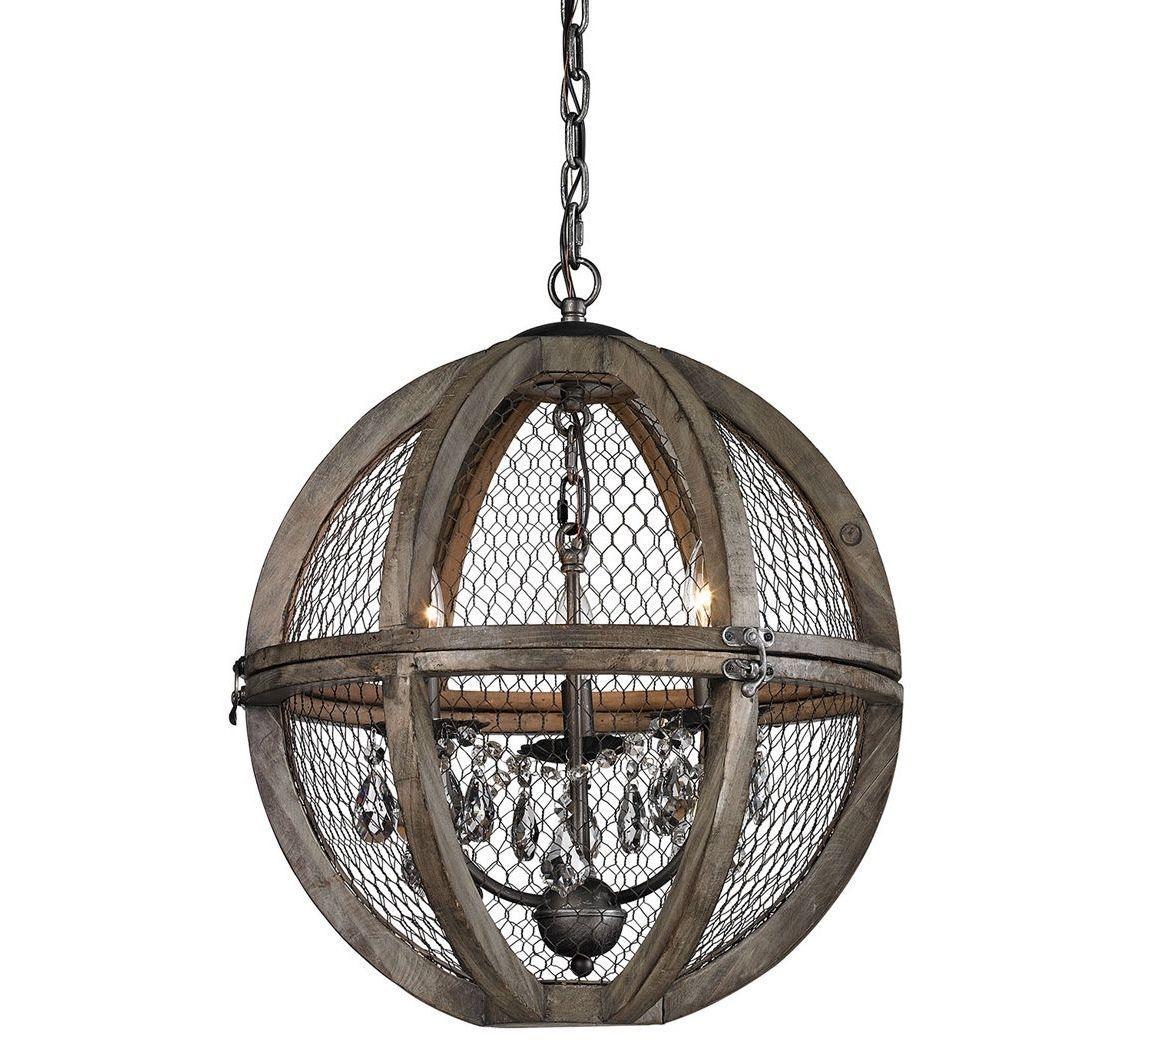 Orb Chandelier French Farmhouse Crystals Restoration Wood & Wire Globe $678 - $478.27